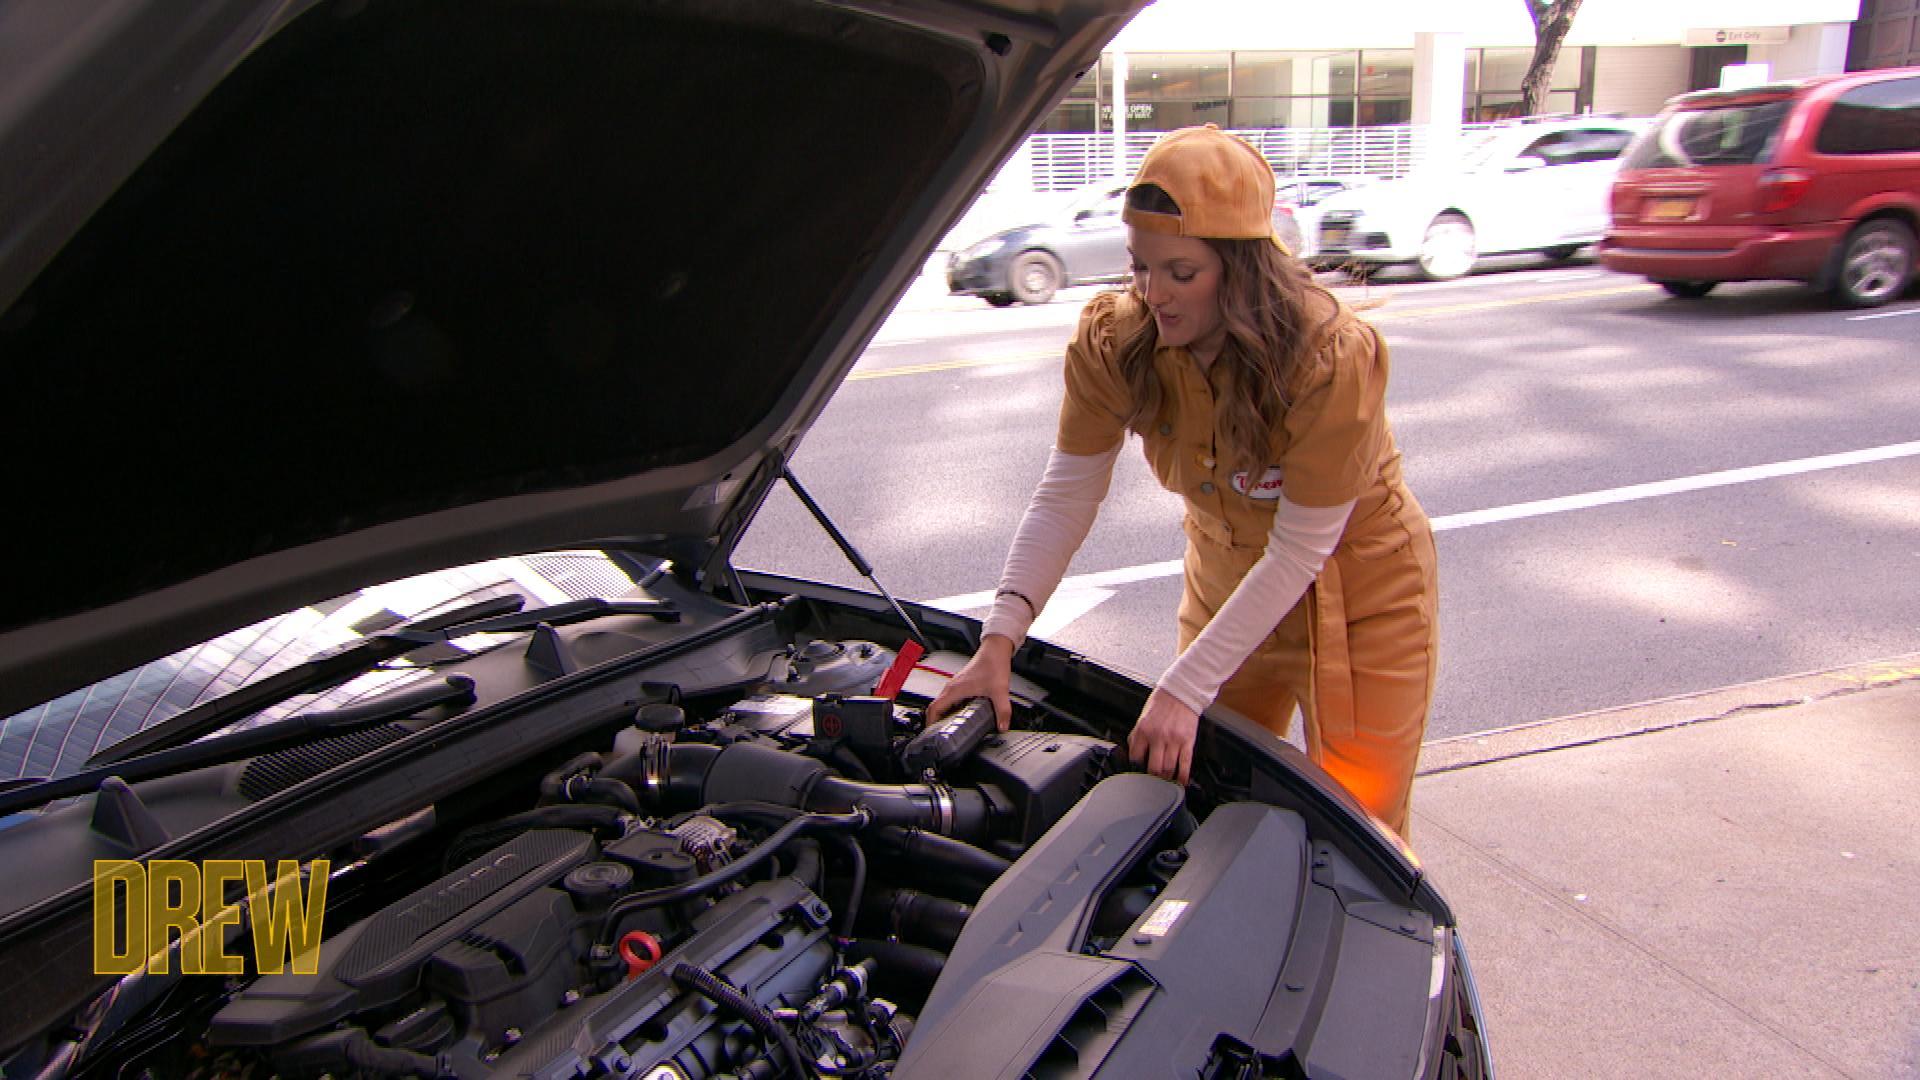 Drew checking car